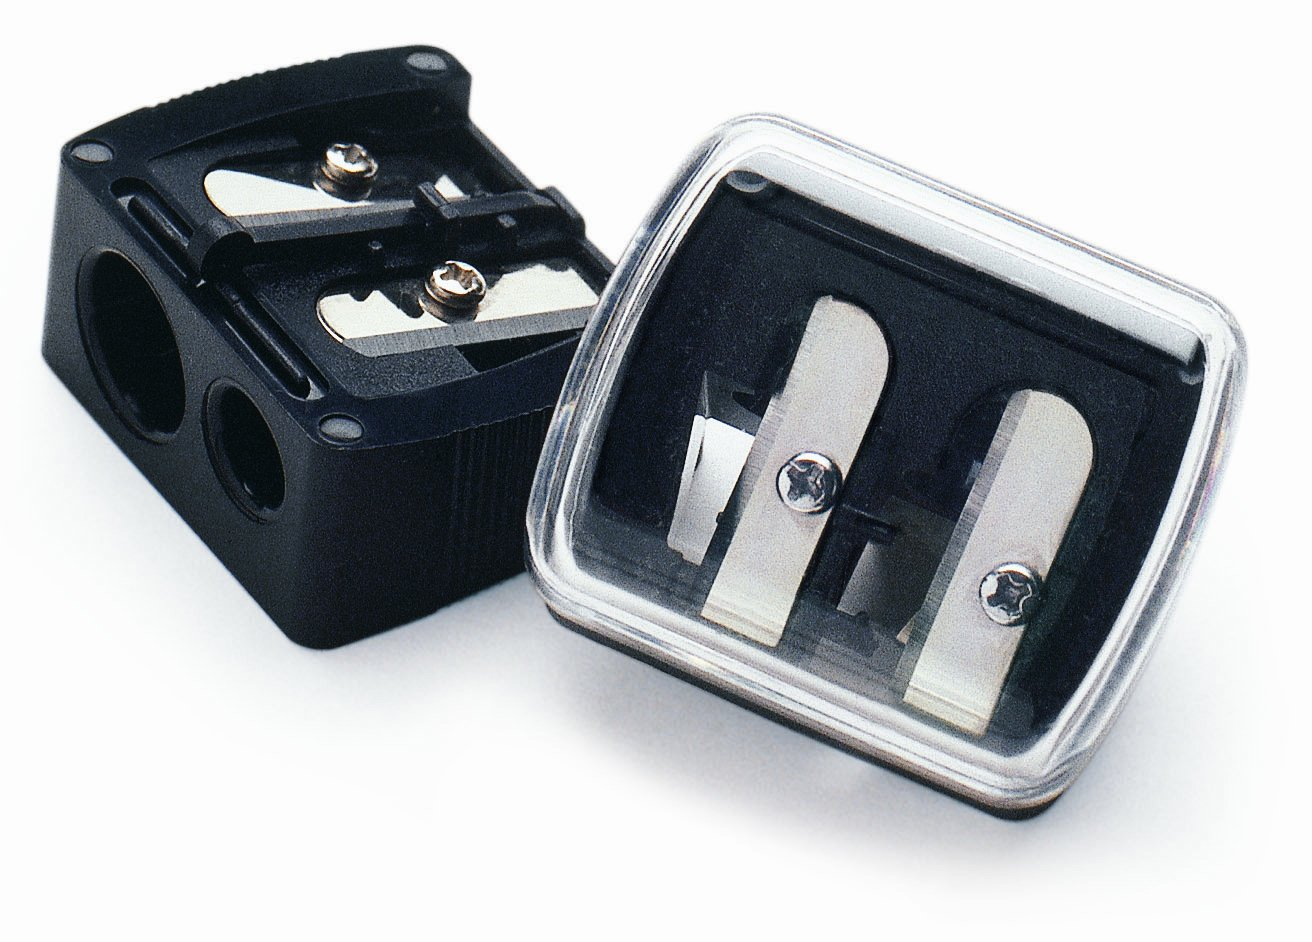 Prestige Duo Sharpener - 6008 : Makeup Sharpeners : Beauty